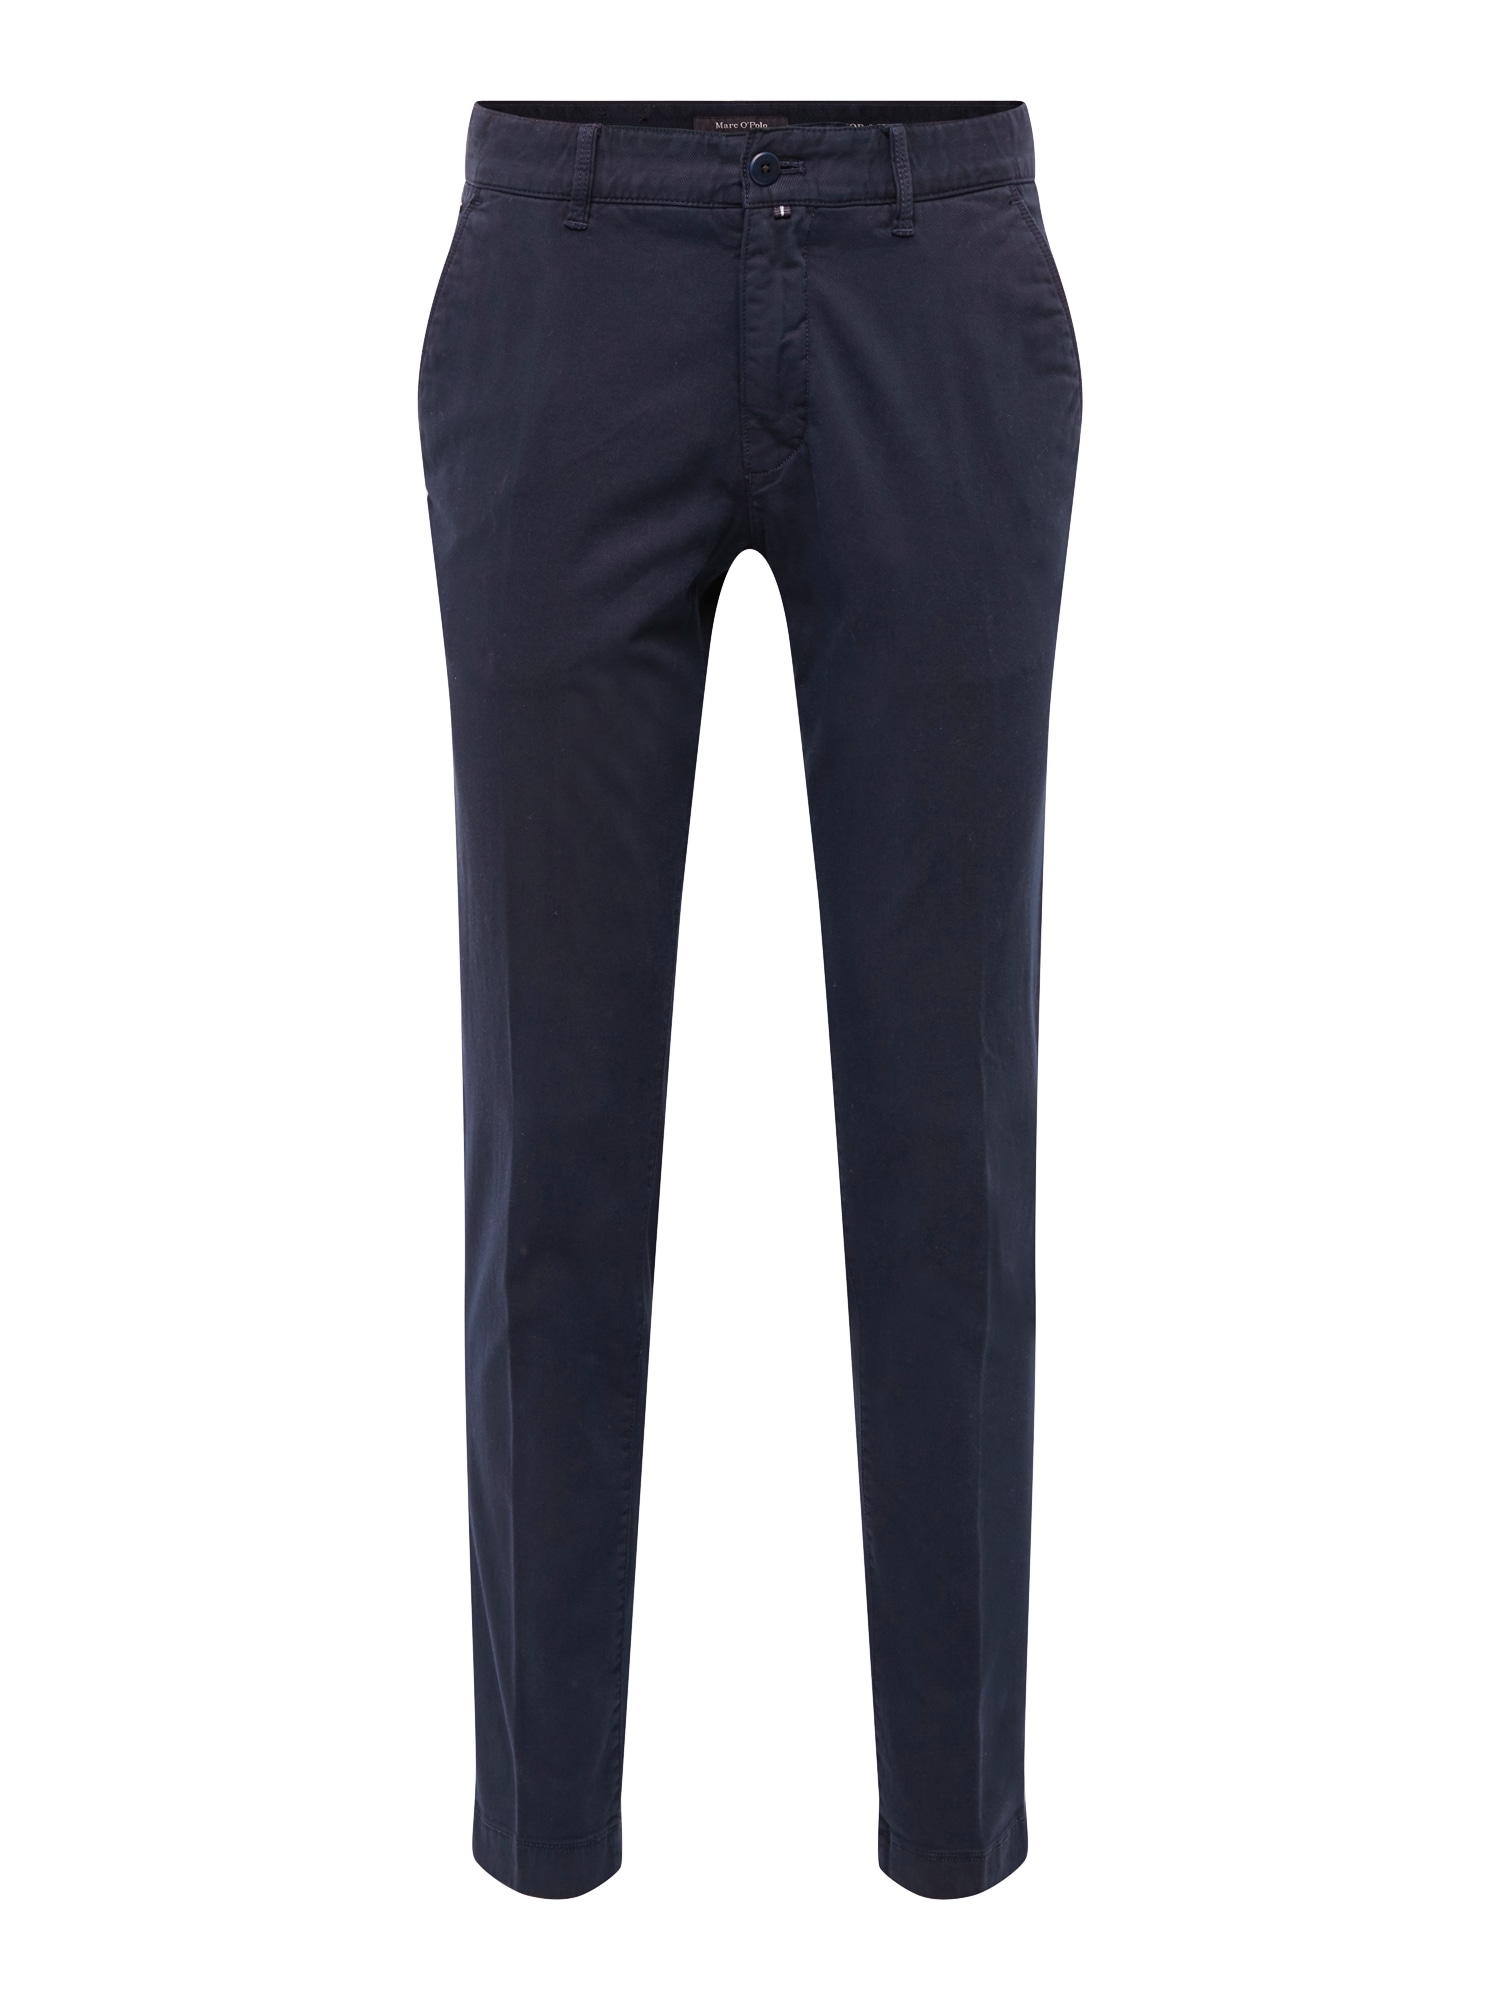 Marc OPolo Chino kalhoty WOVEN PANTS tmavě modrá Marc O'Polo